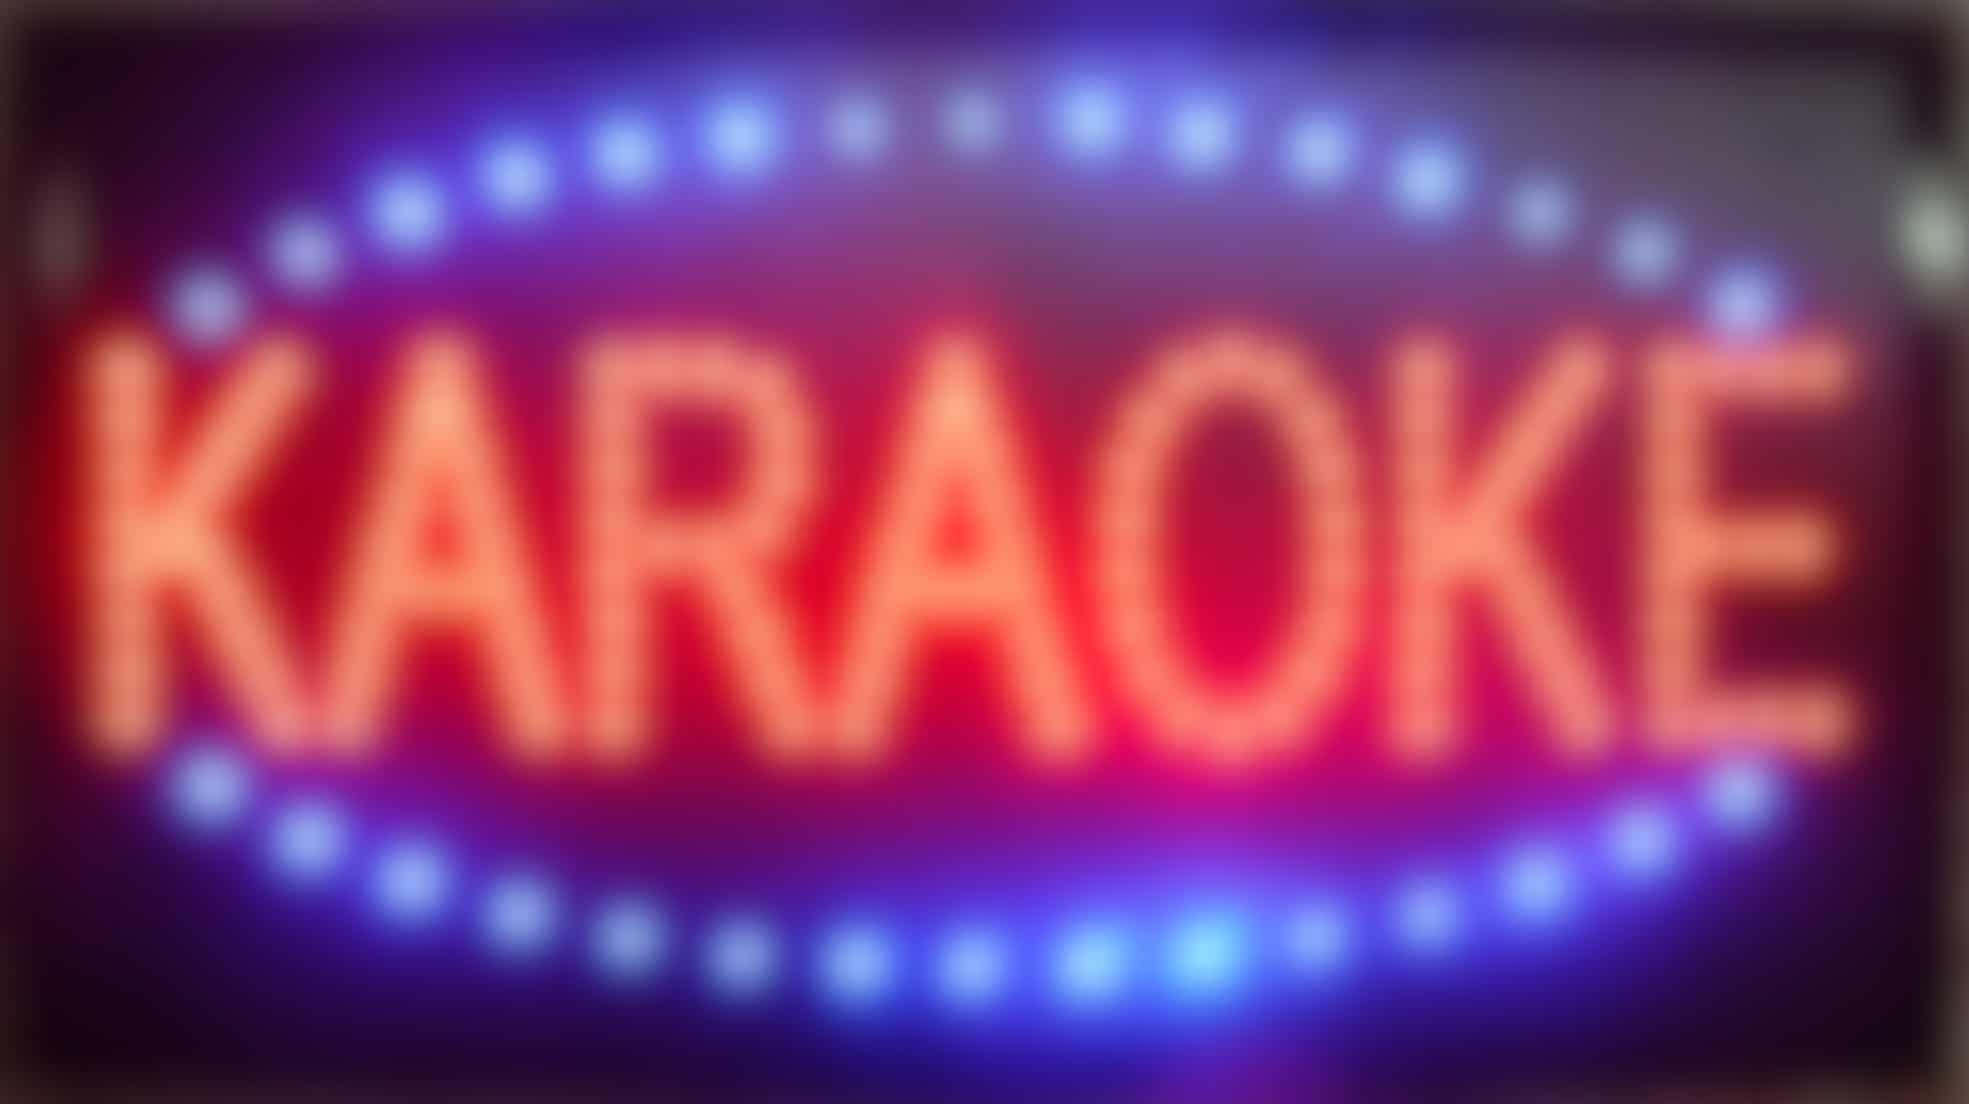 Karaokemiddag